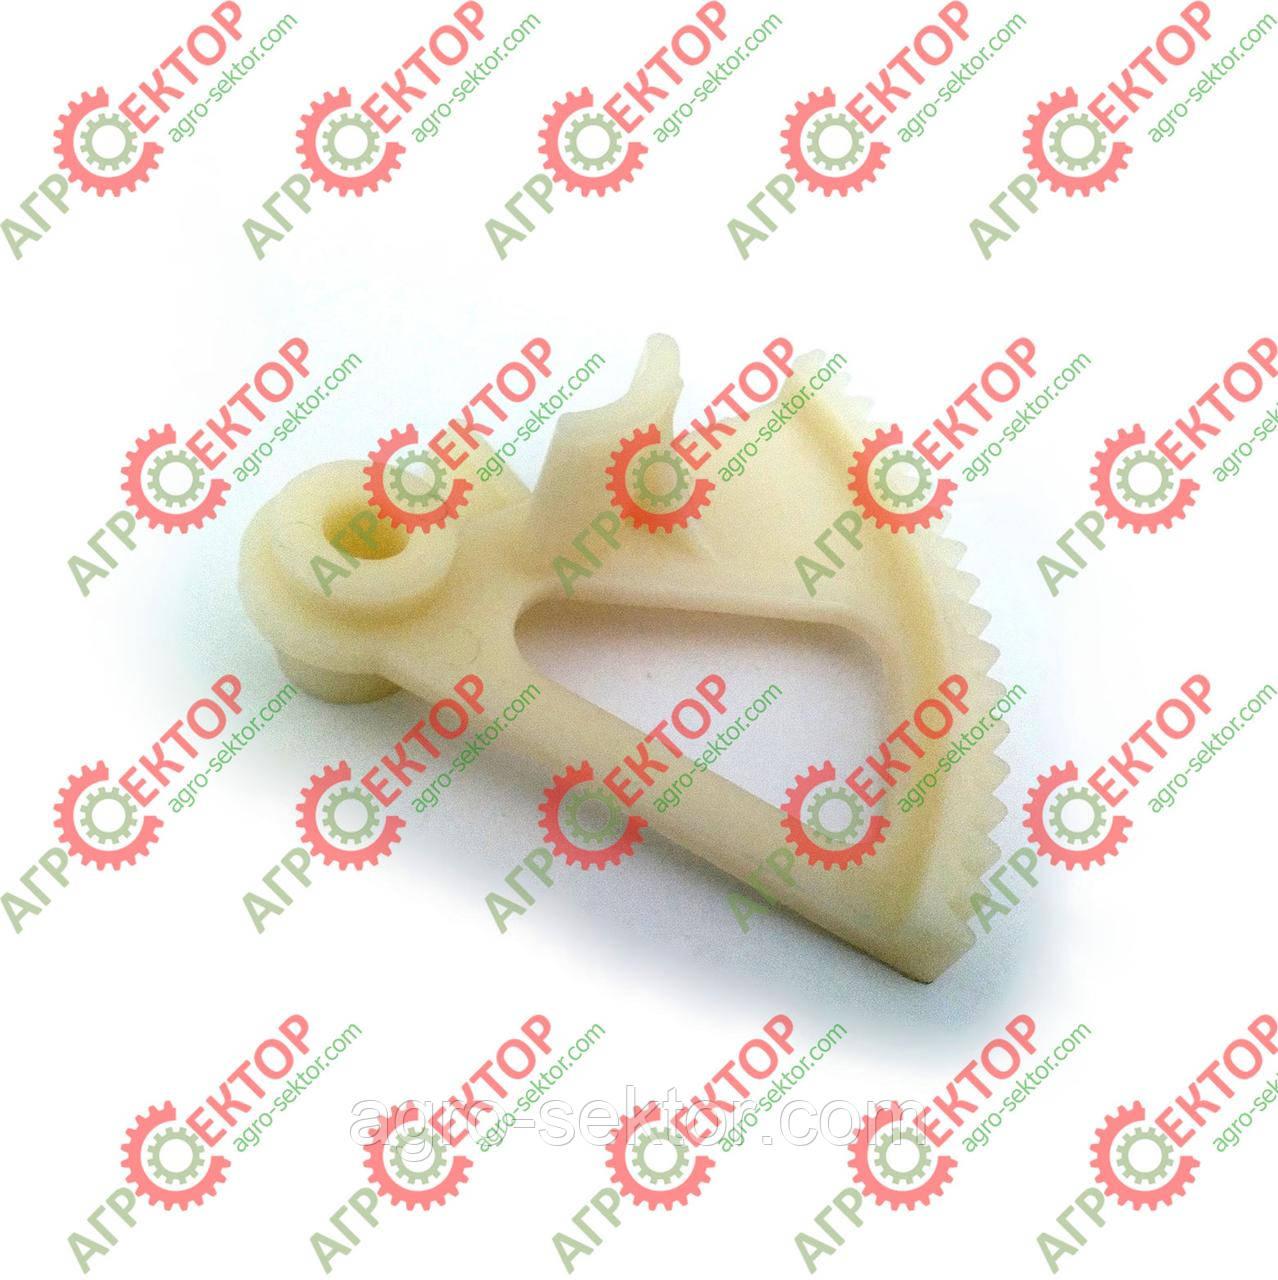 Зубчатый сектор регулироовки довжини тюка Сlaas Markant 800435.3